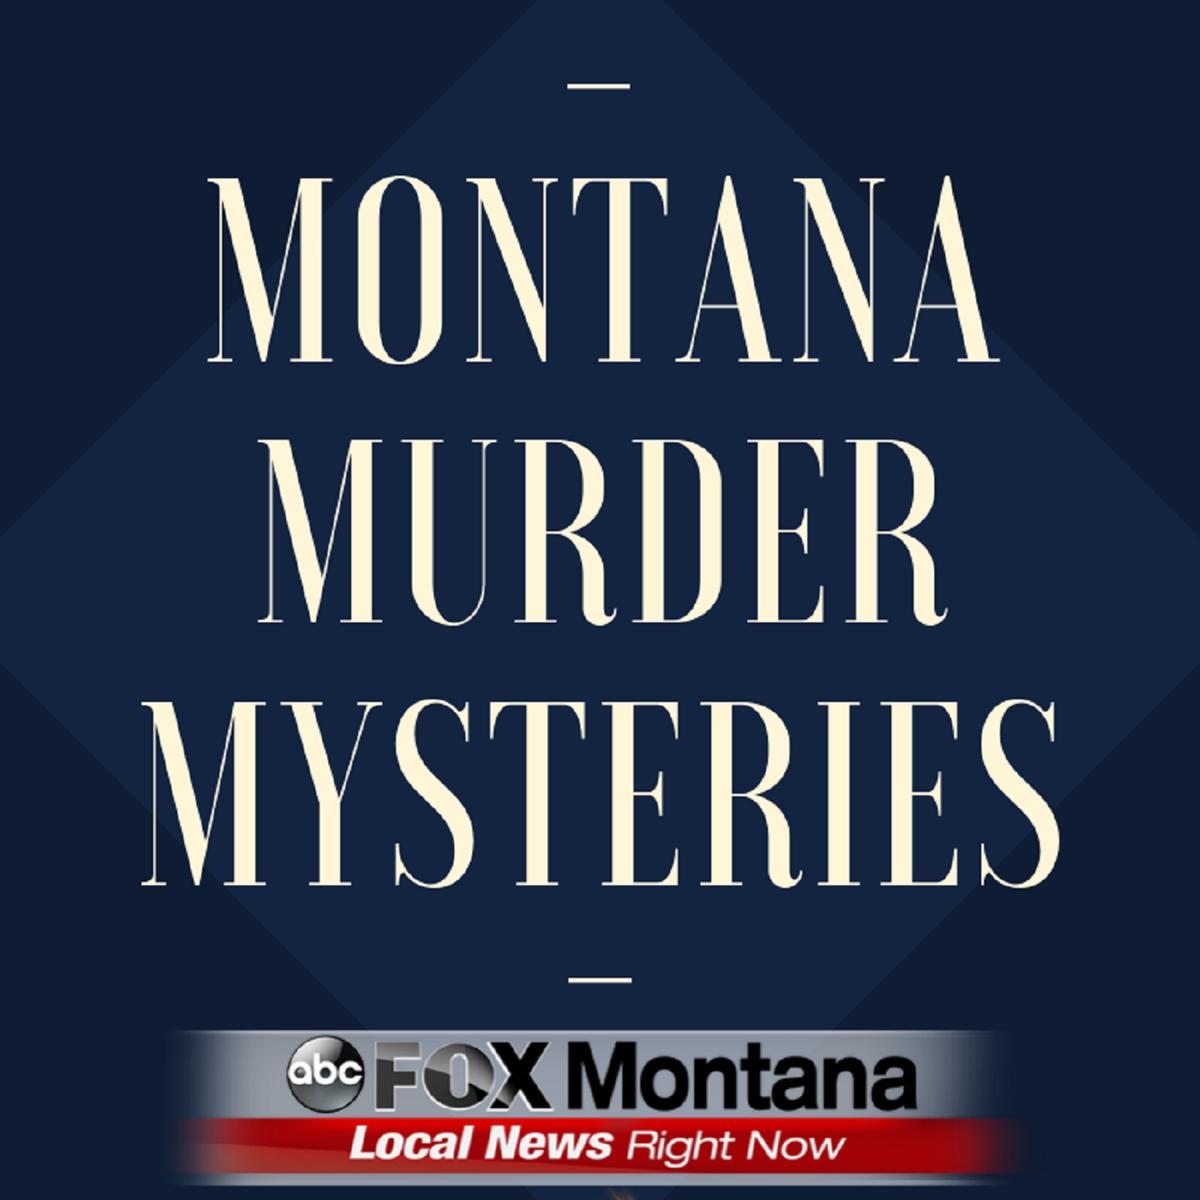 montana murder mysteries